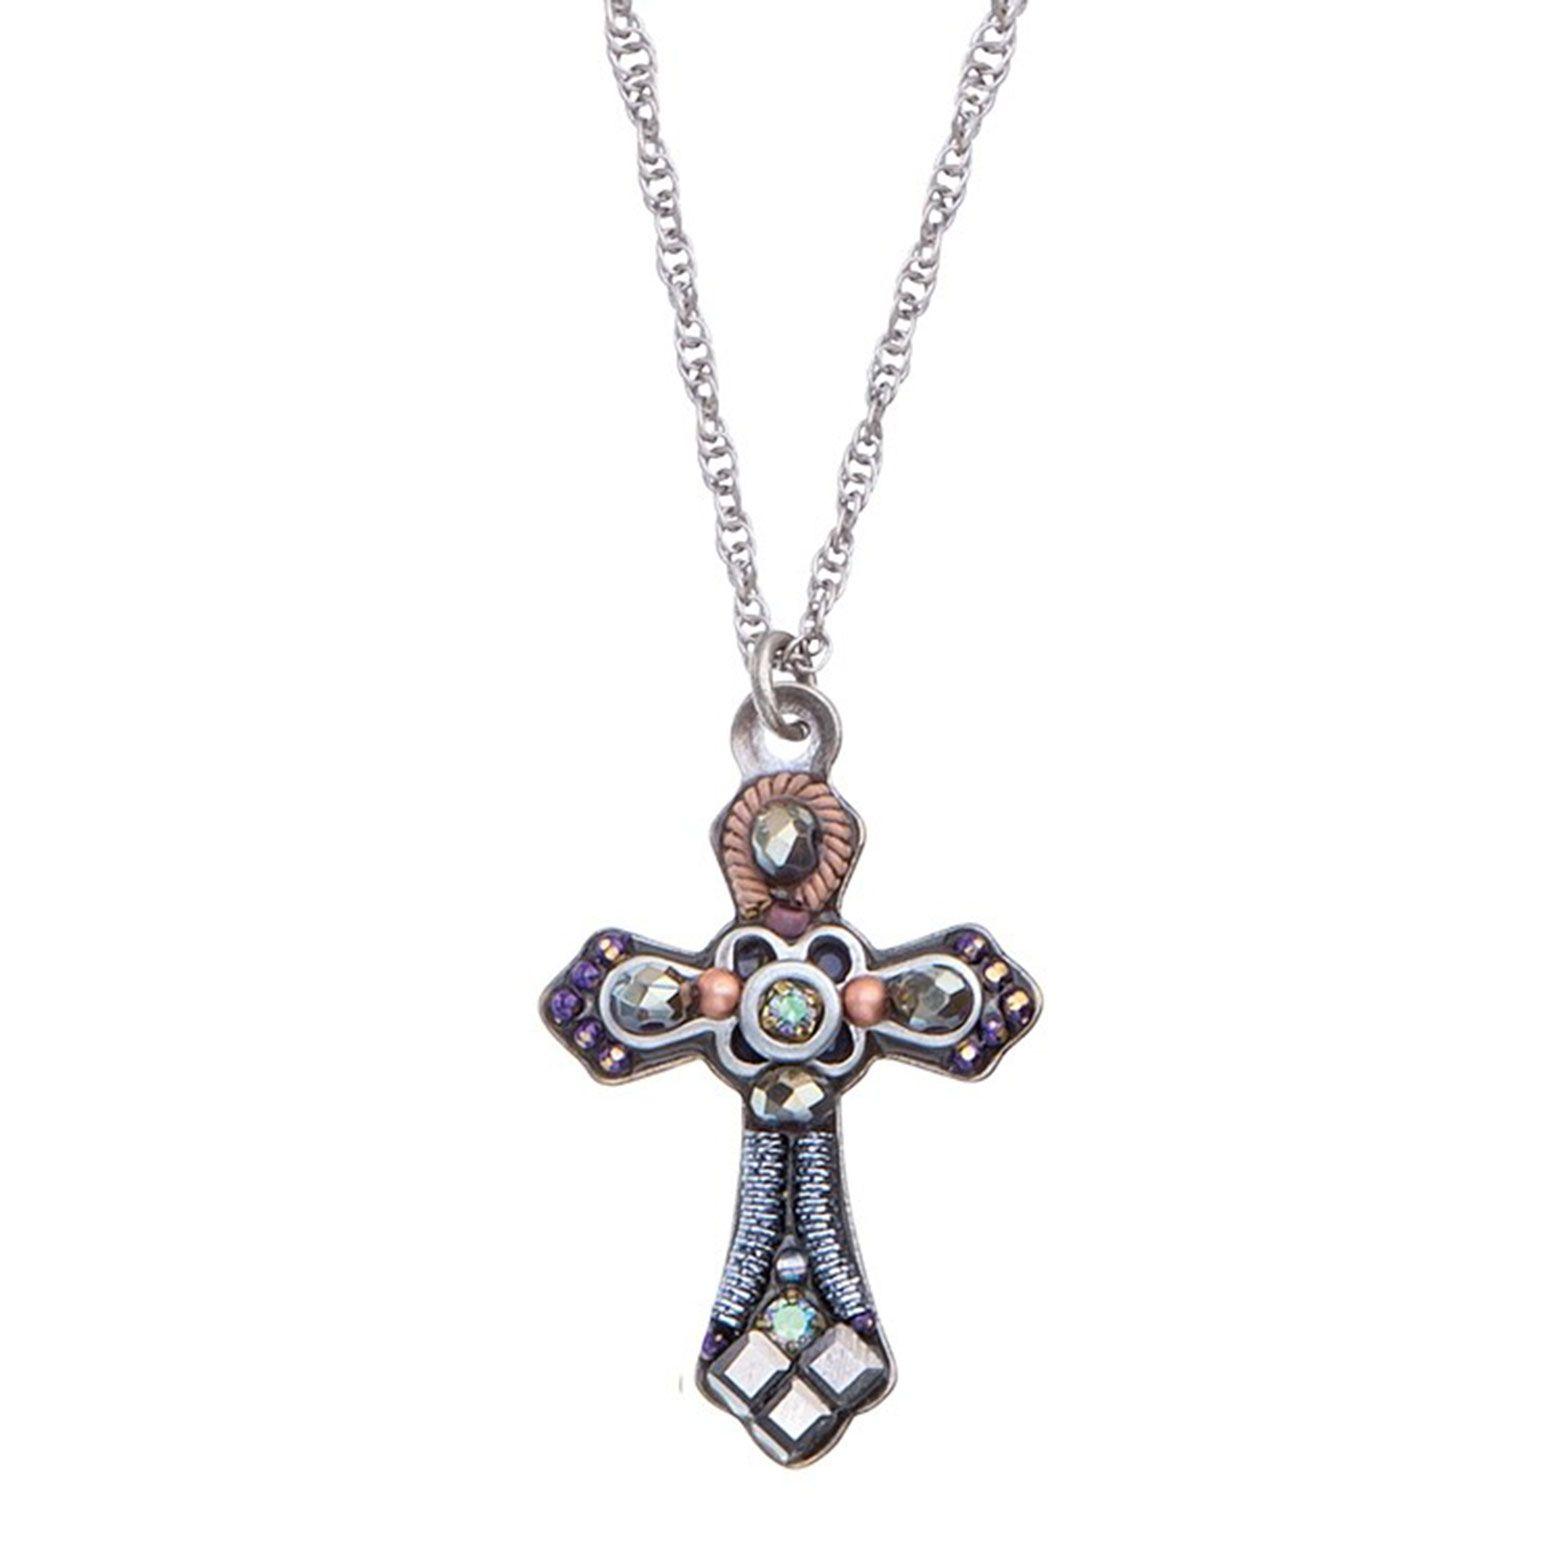 Ayala Bar Israeli Jewelry - Silver Cross Necklace - Fall/Winter 2018